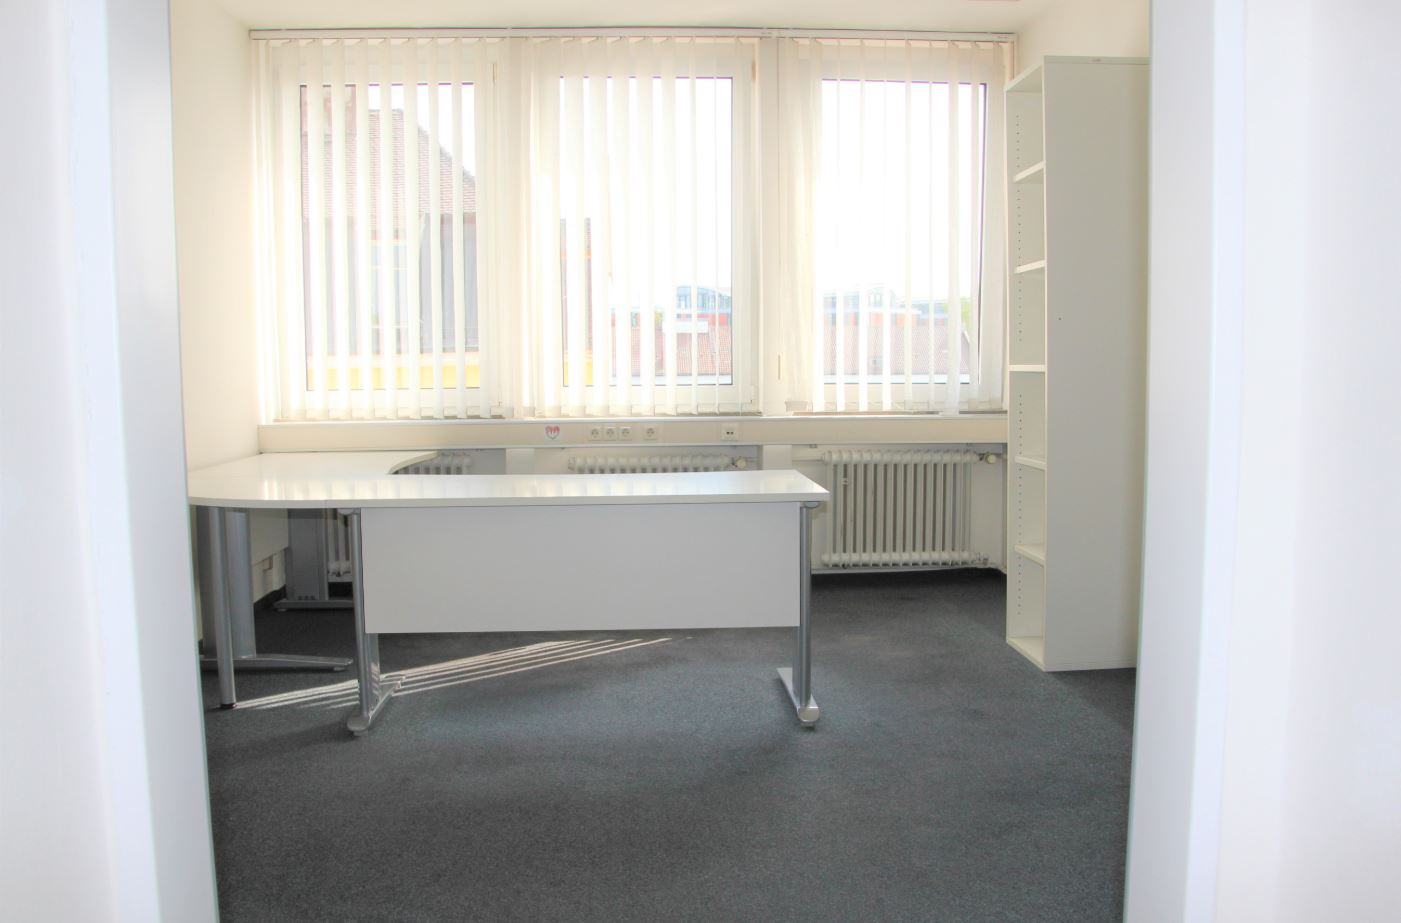 Elsenheimerstraße 15 einzelbüro 3